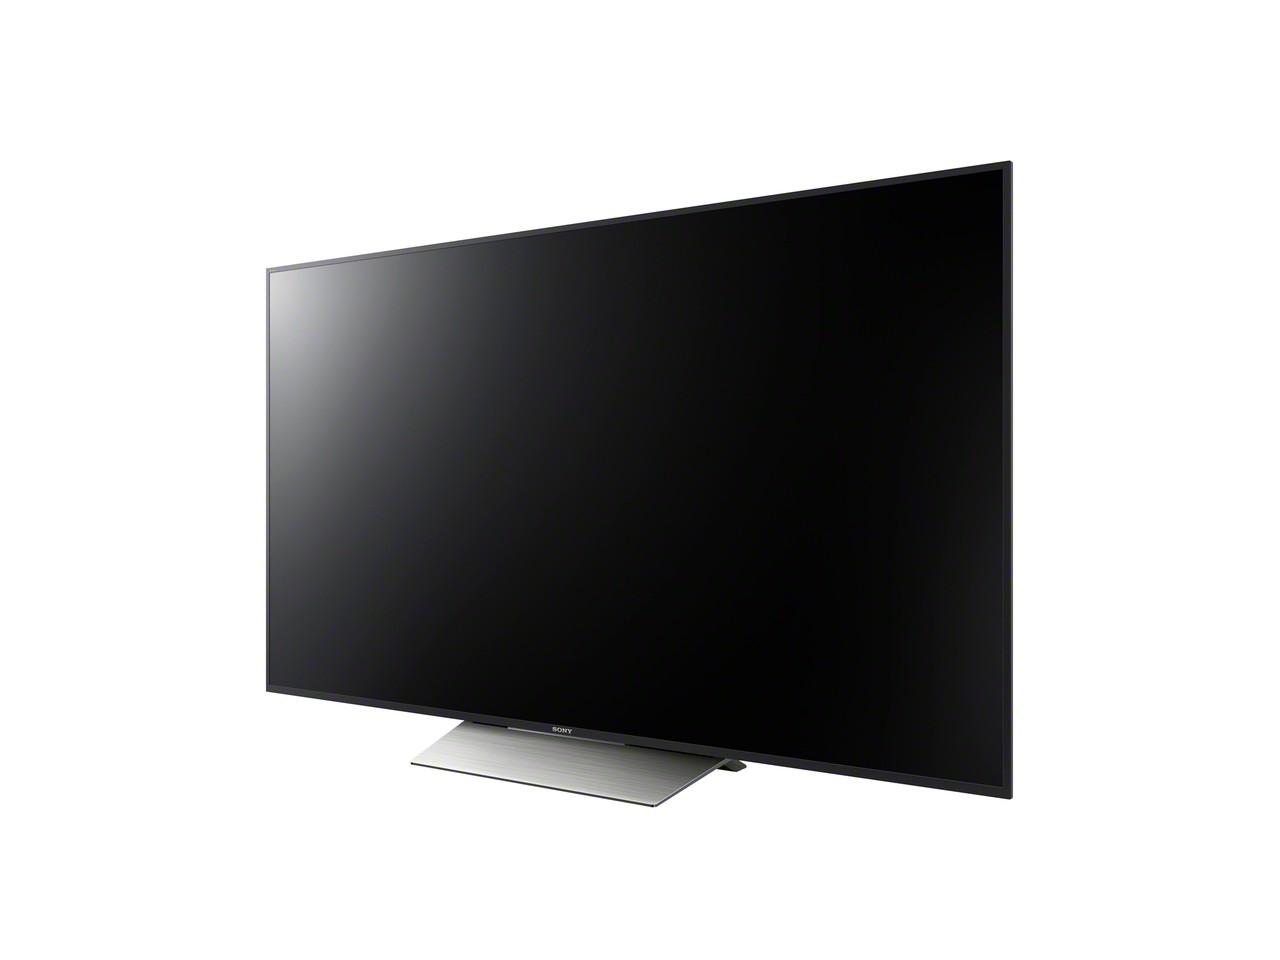 sony a1 oled tv heimkino gmbh. Black Bedroom Furniture Sets. Home Design Ideas